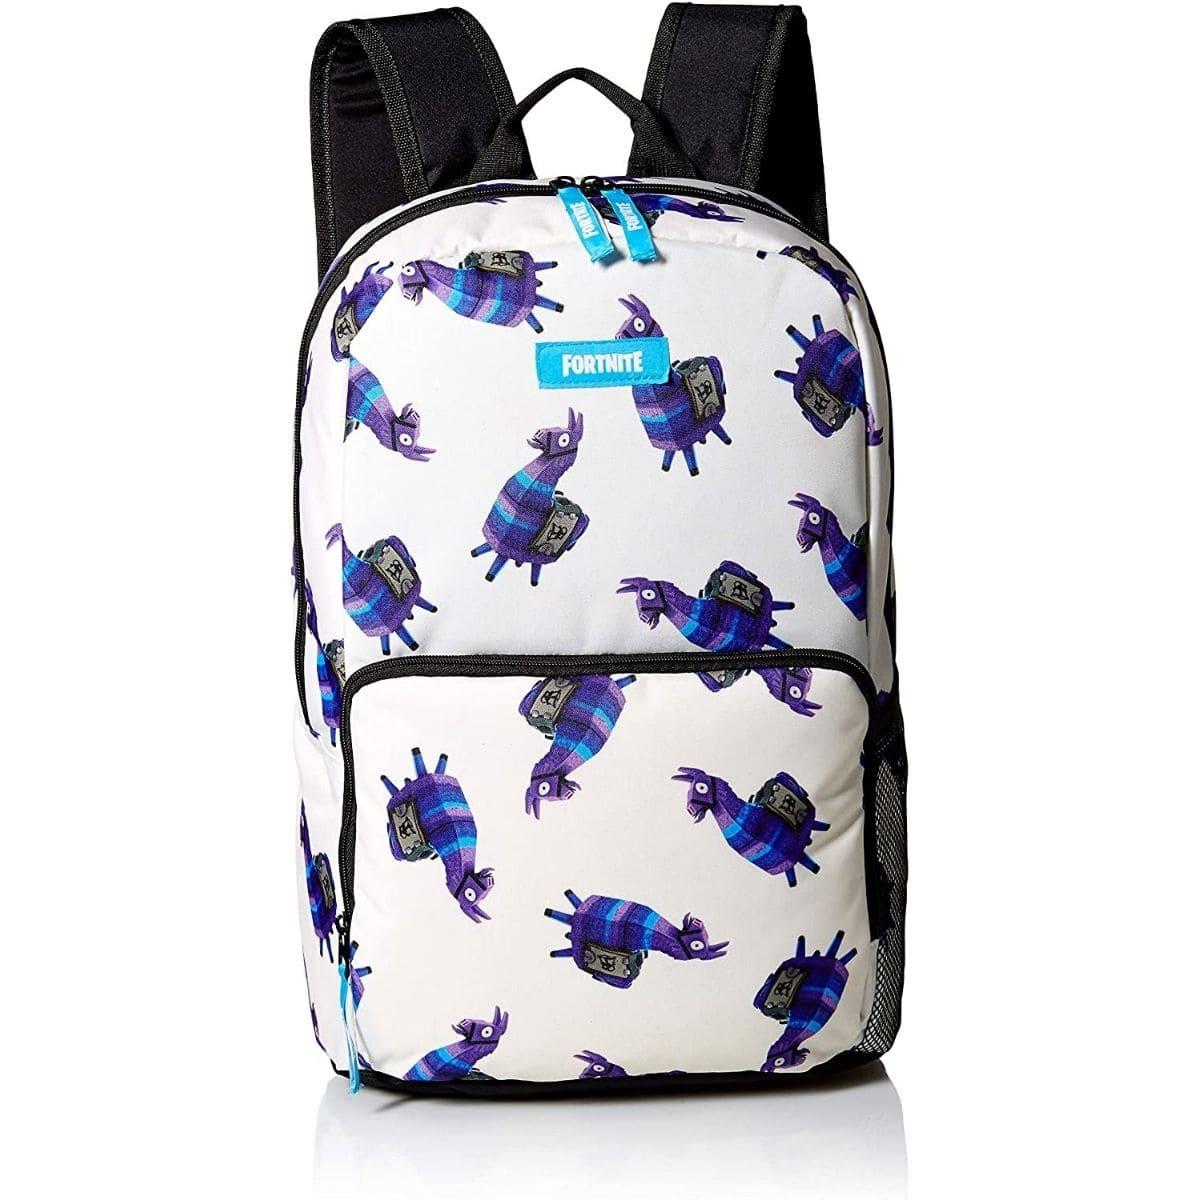 Fortnite Little Amplify Llama School Backpack